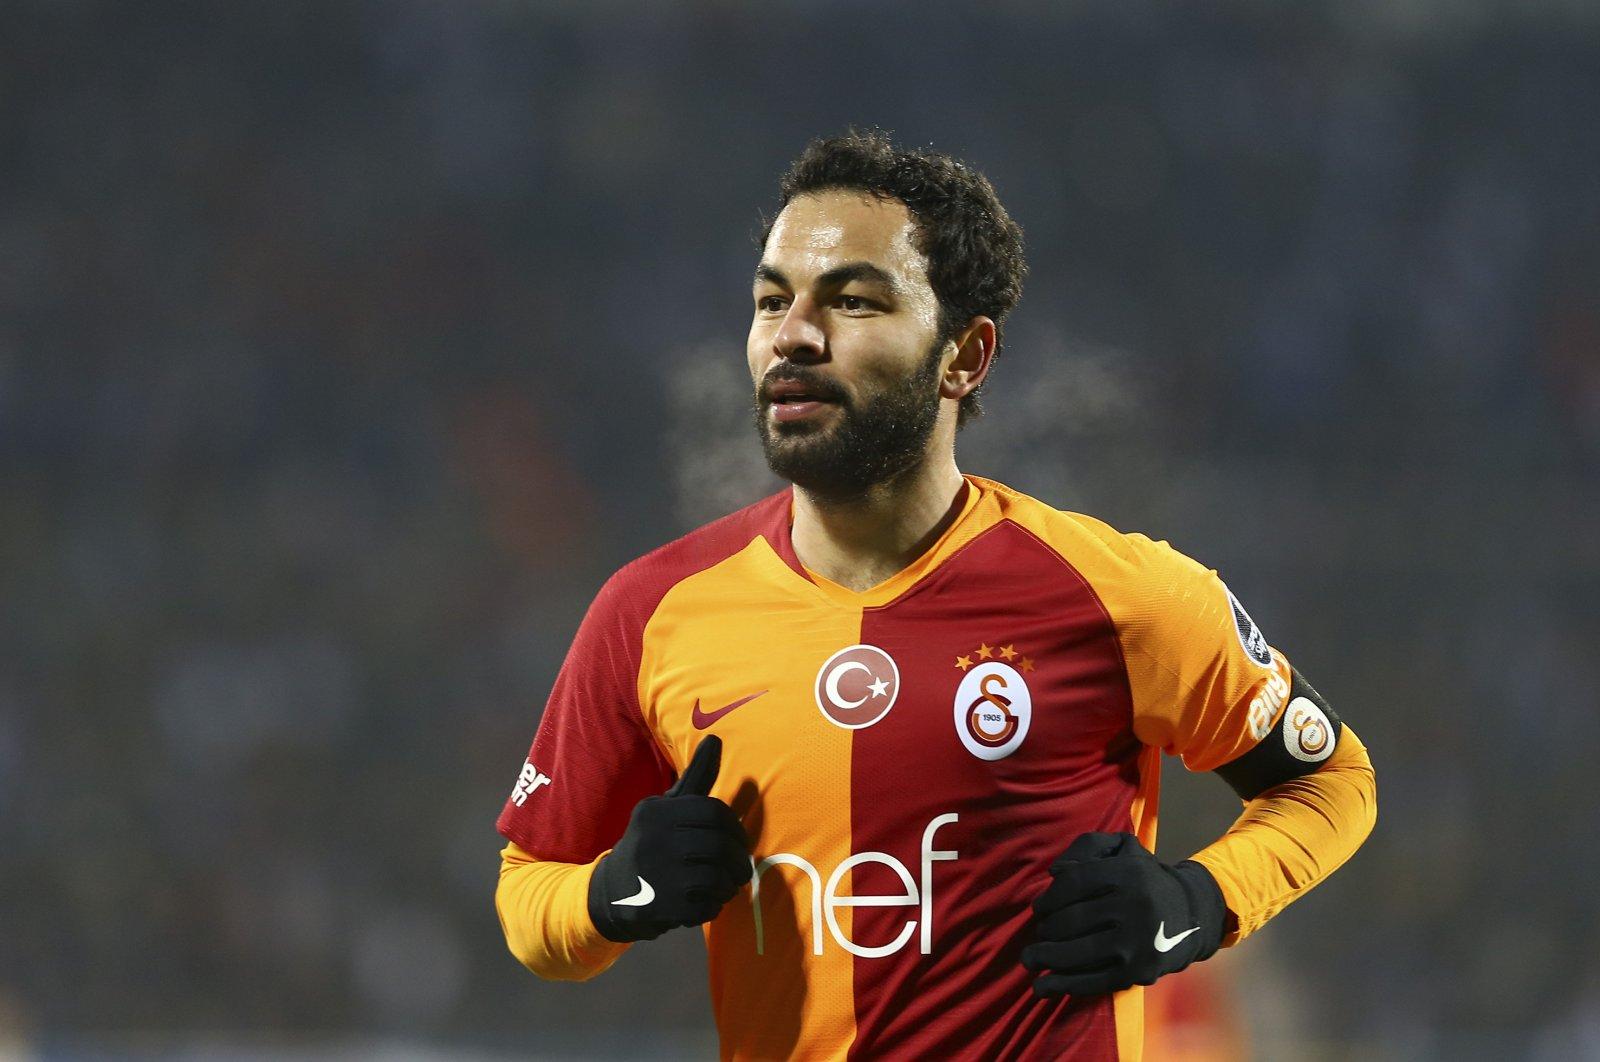 Selçuk Inan runs during a match against Erzurumspor, Erzurum, Turkey, March 3, 2019. (AA Photo)